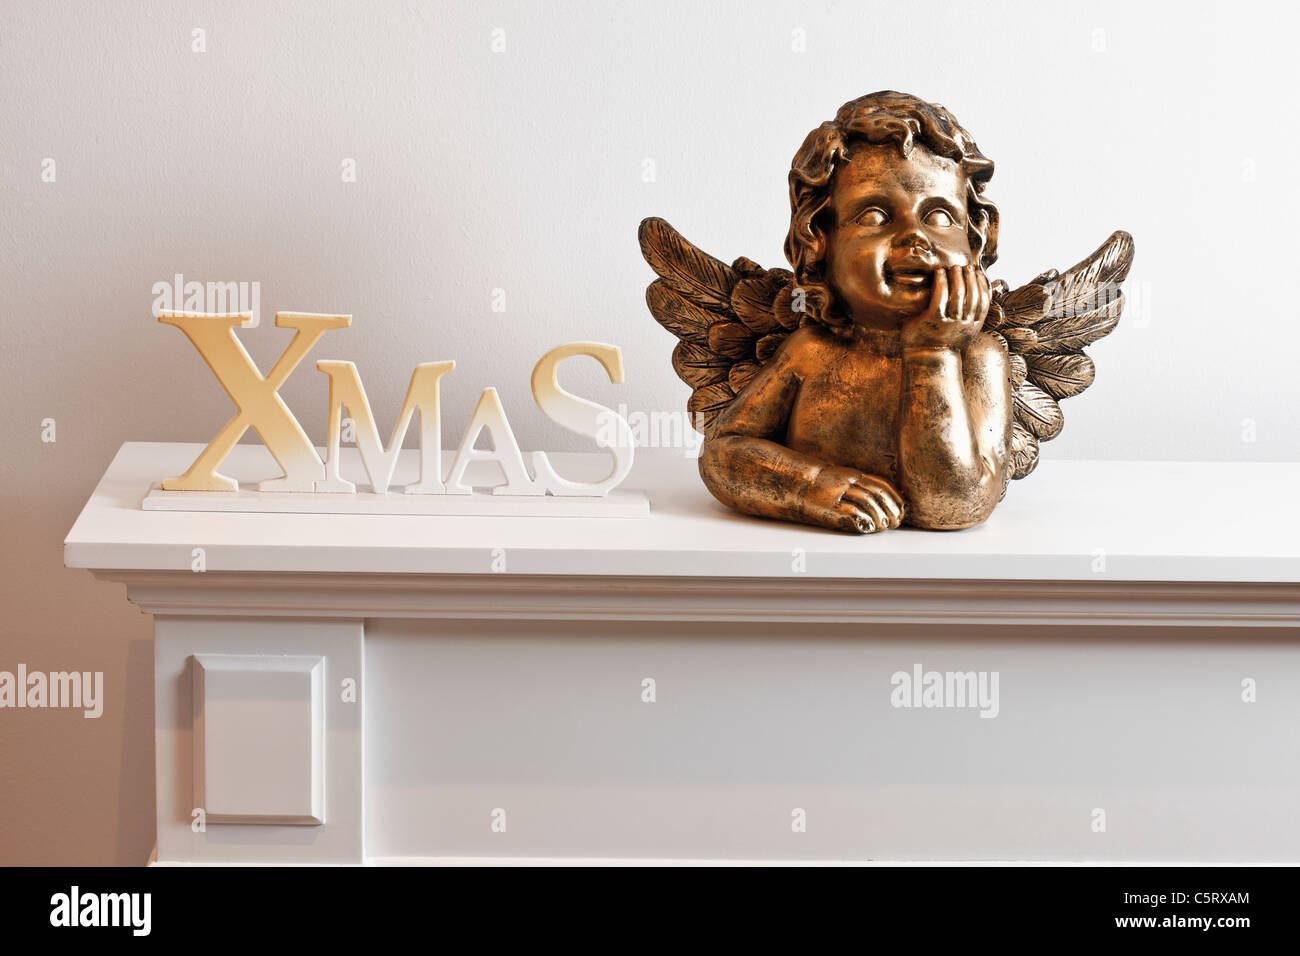 Angel figurine and decoration on shelf - Stock Image